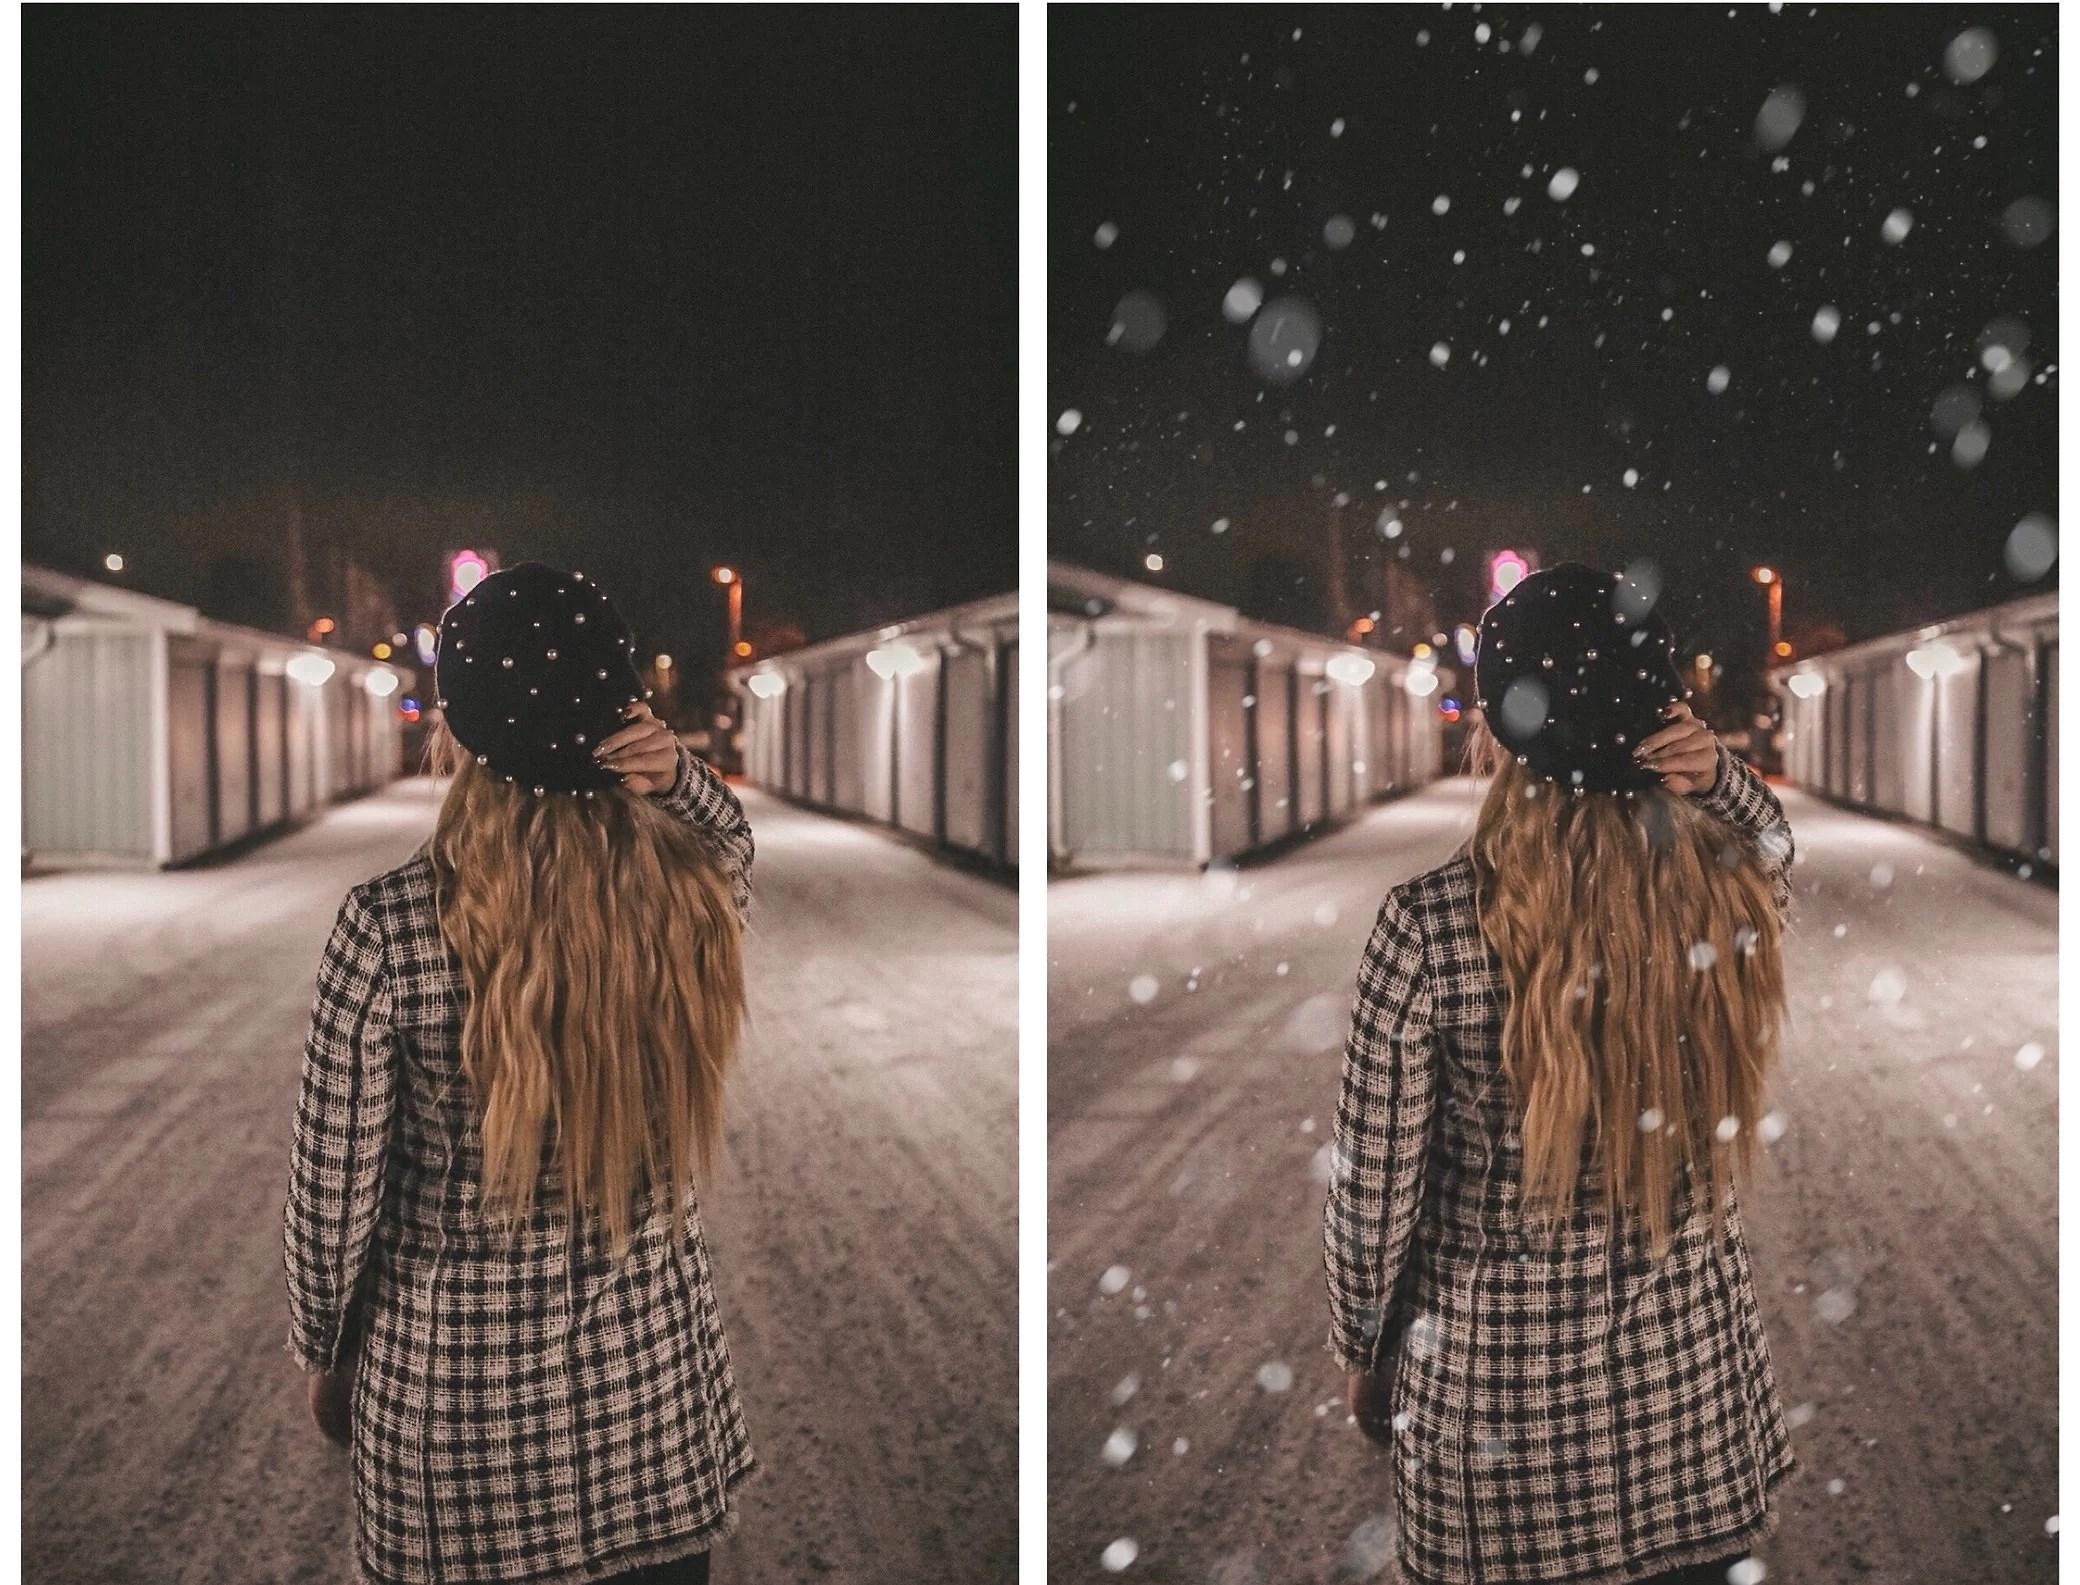 Redigera dit snö på bilder - enkelt i mobilen!